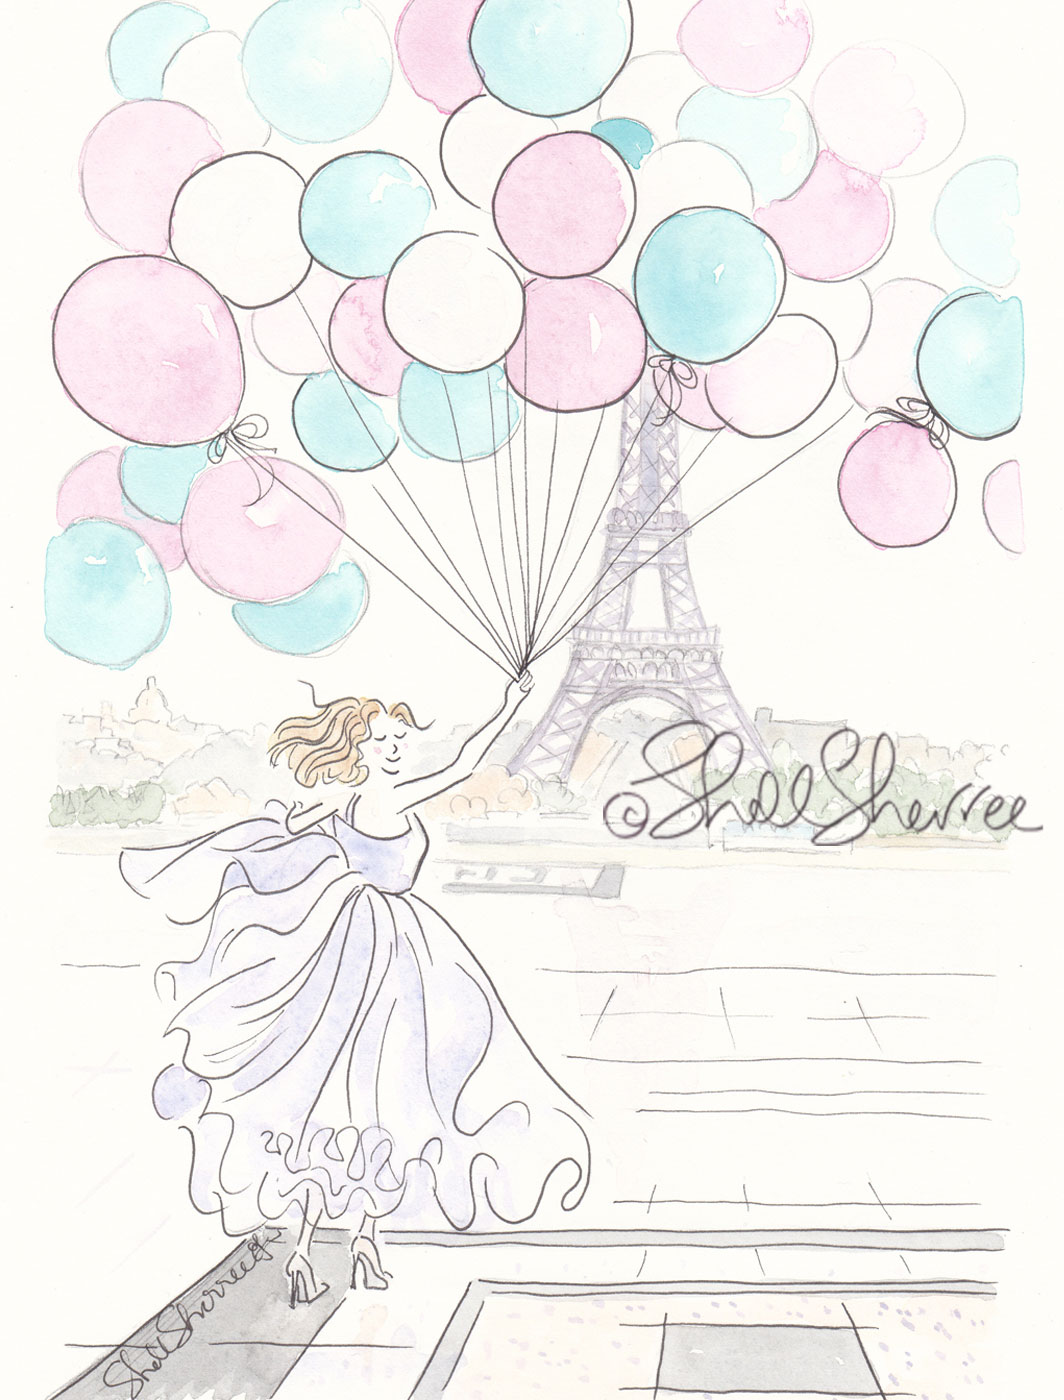 Eiffel Tower Paris, Balloons and Ballgowns fashion illustration © Shell Sherree